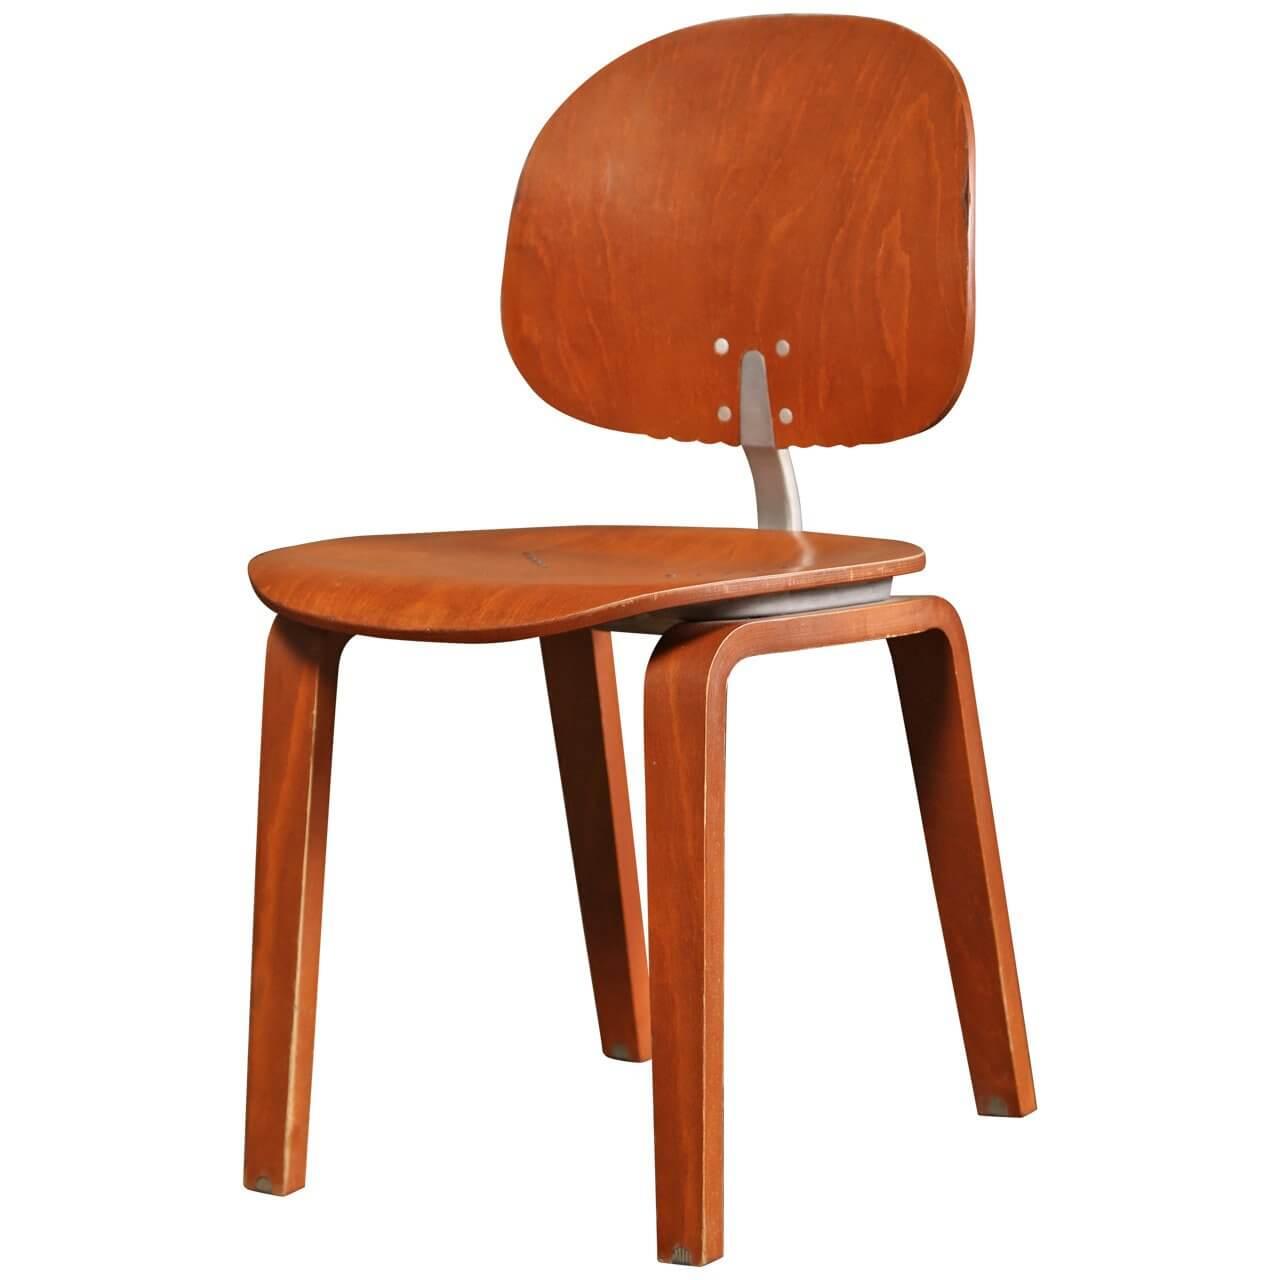 Piretti Xylon Bent Plywood Chair  SOLD  Vintage